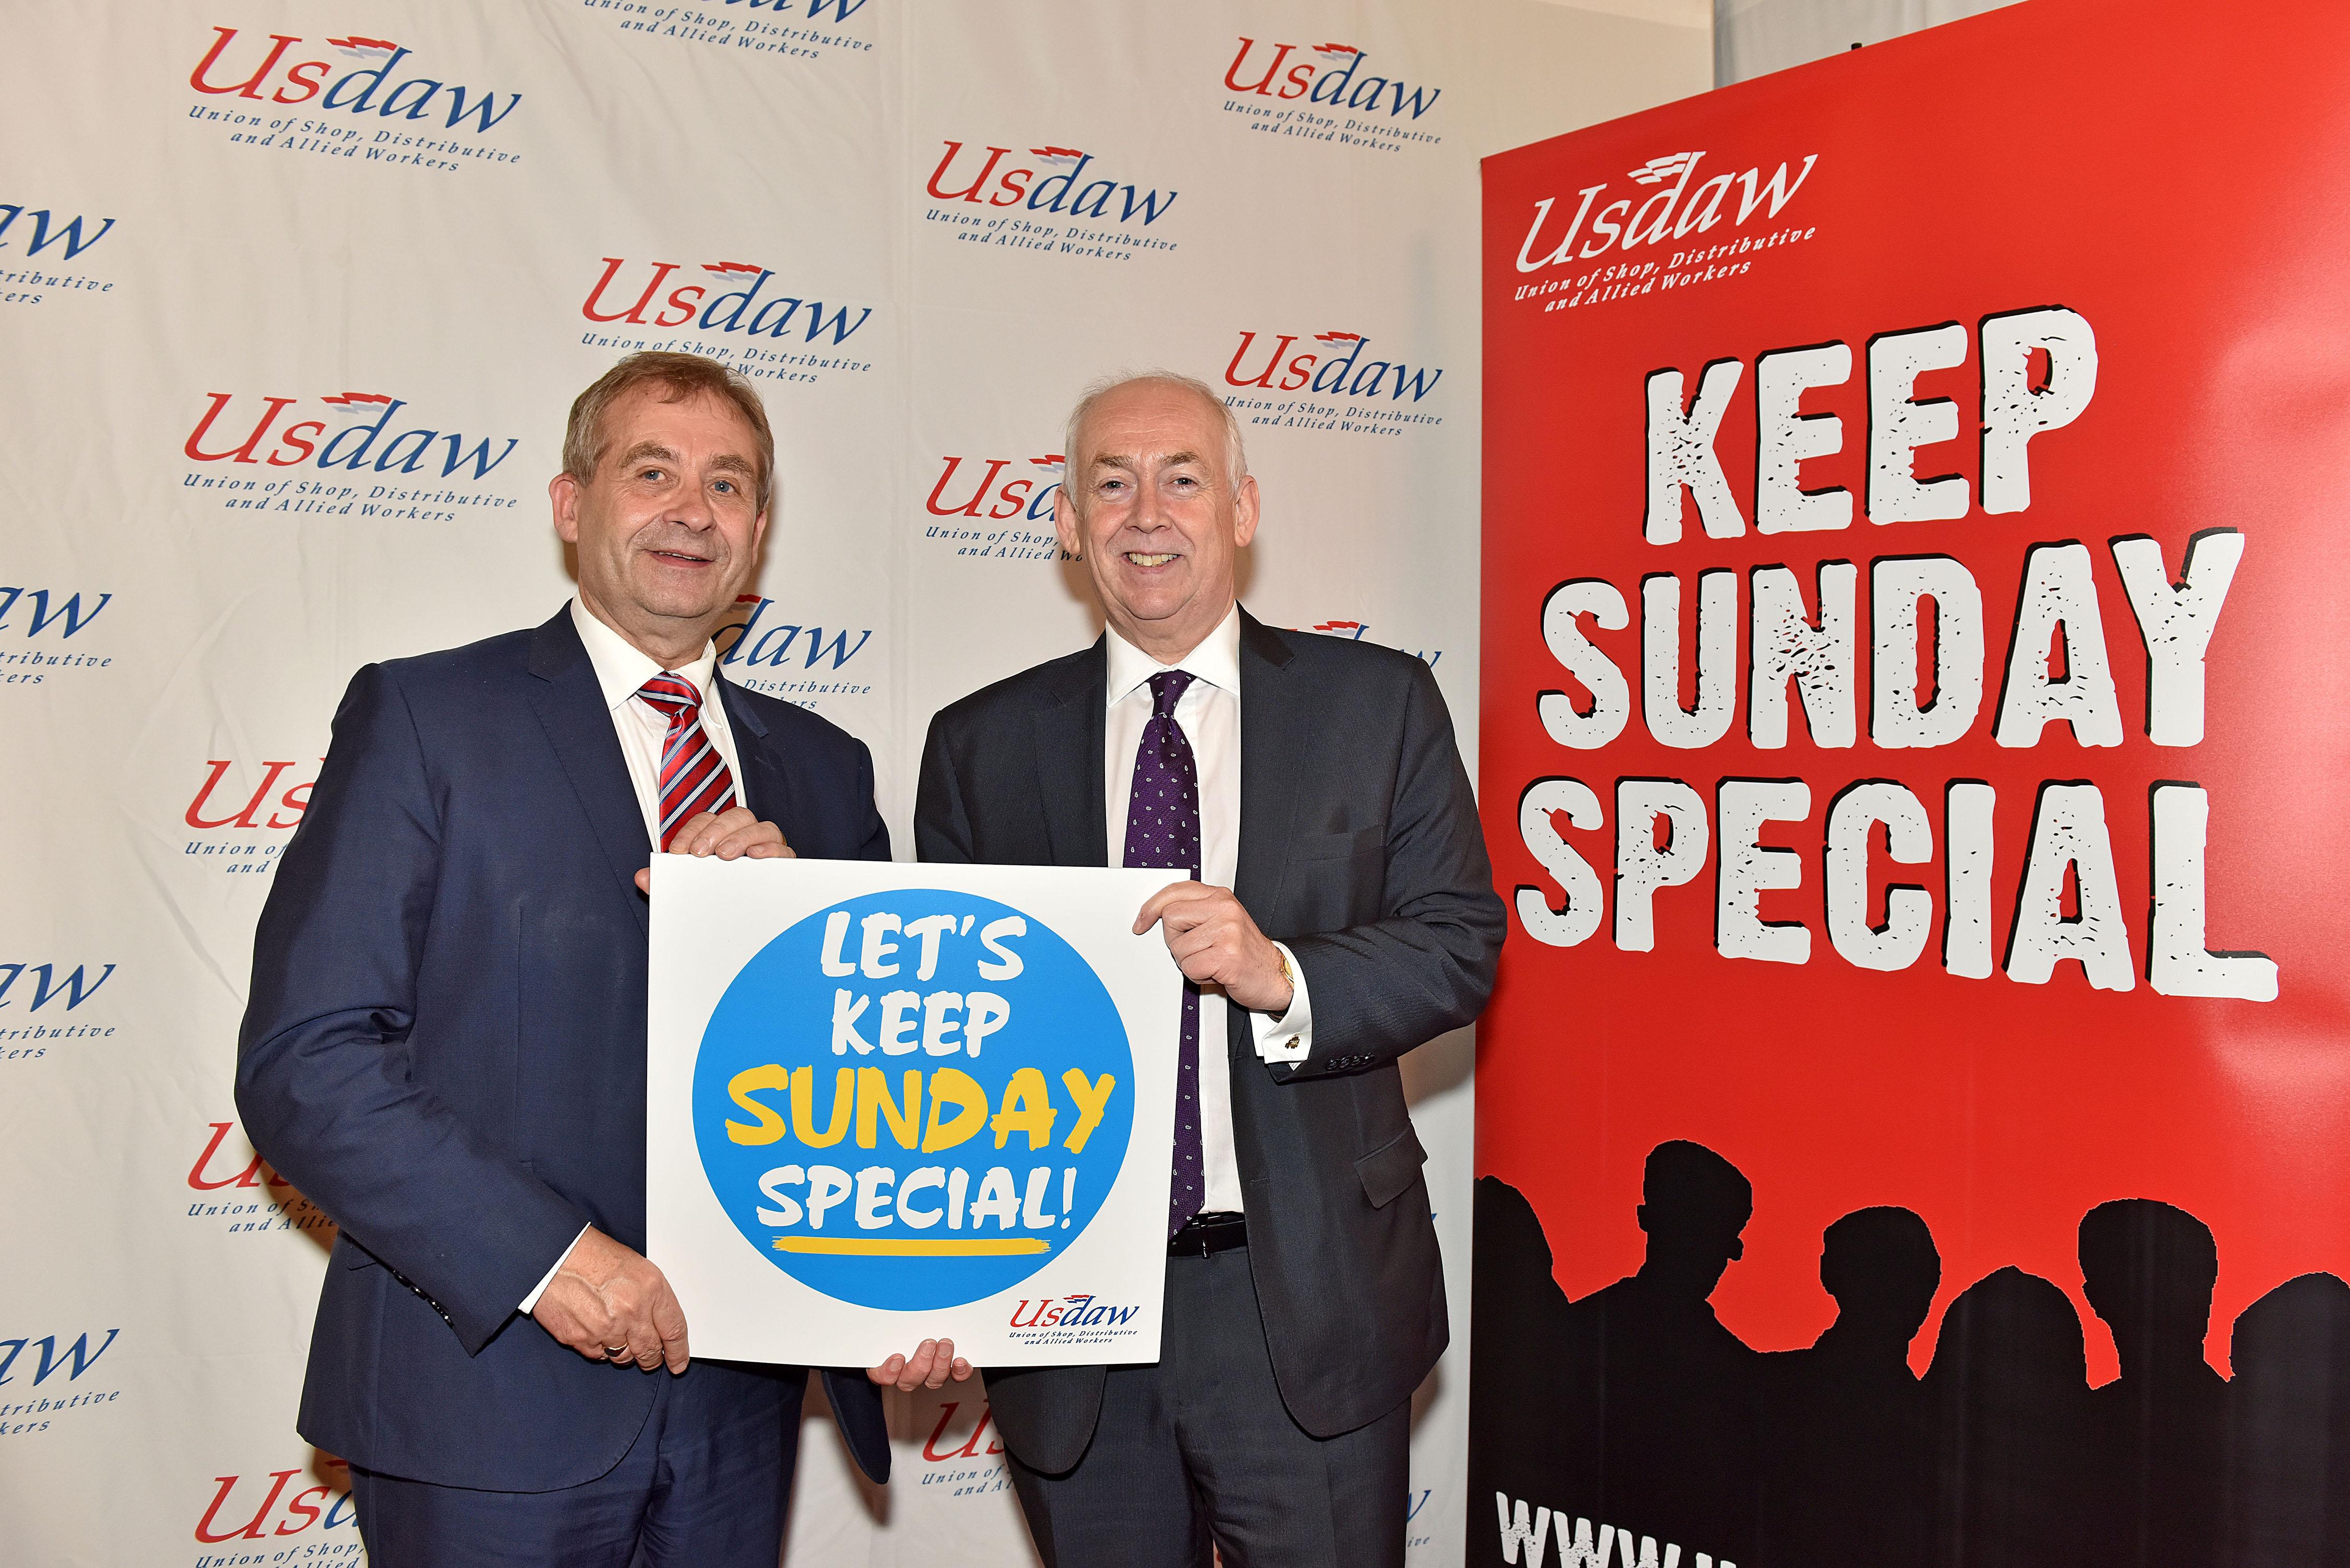 Keep Sunday special